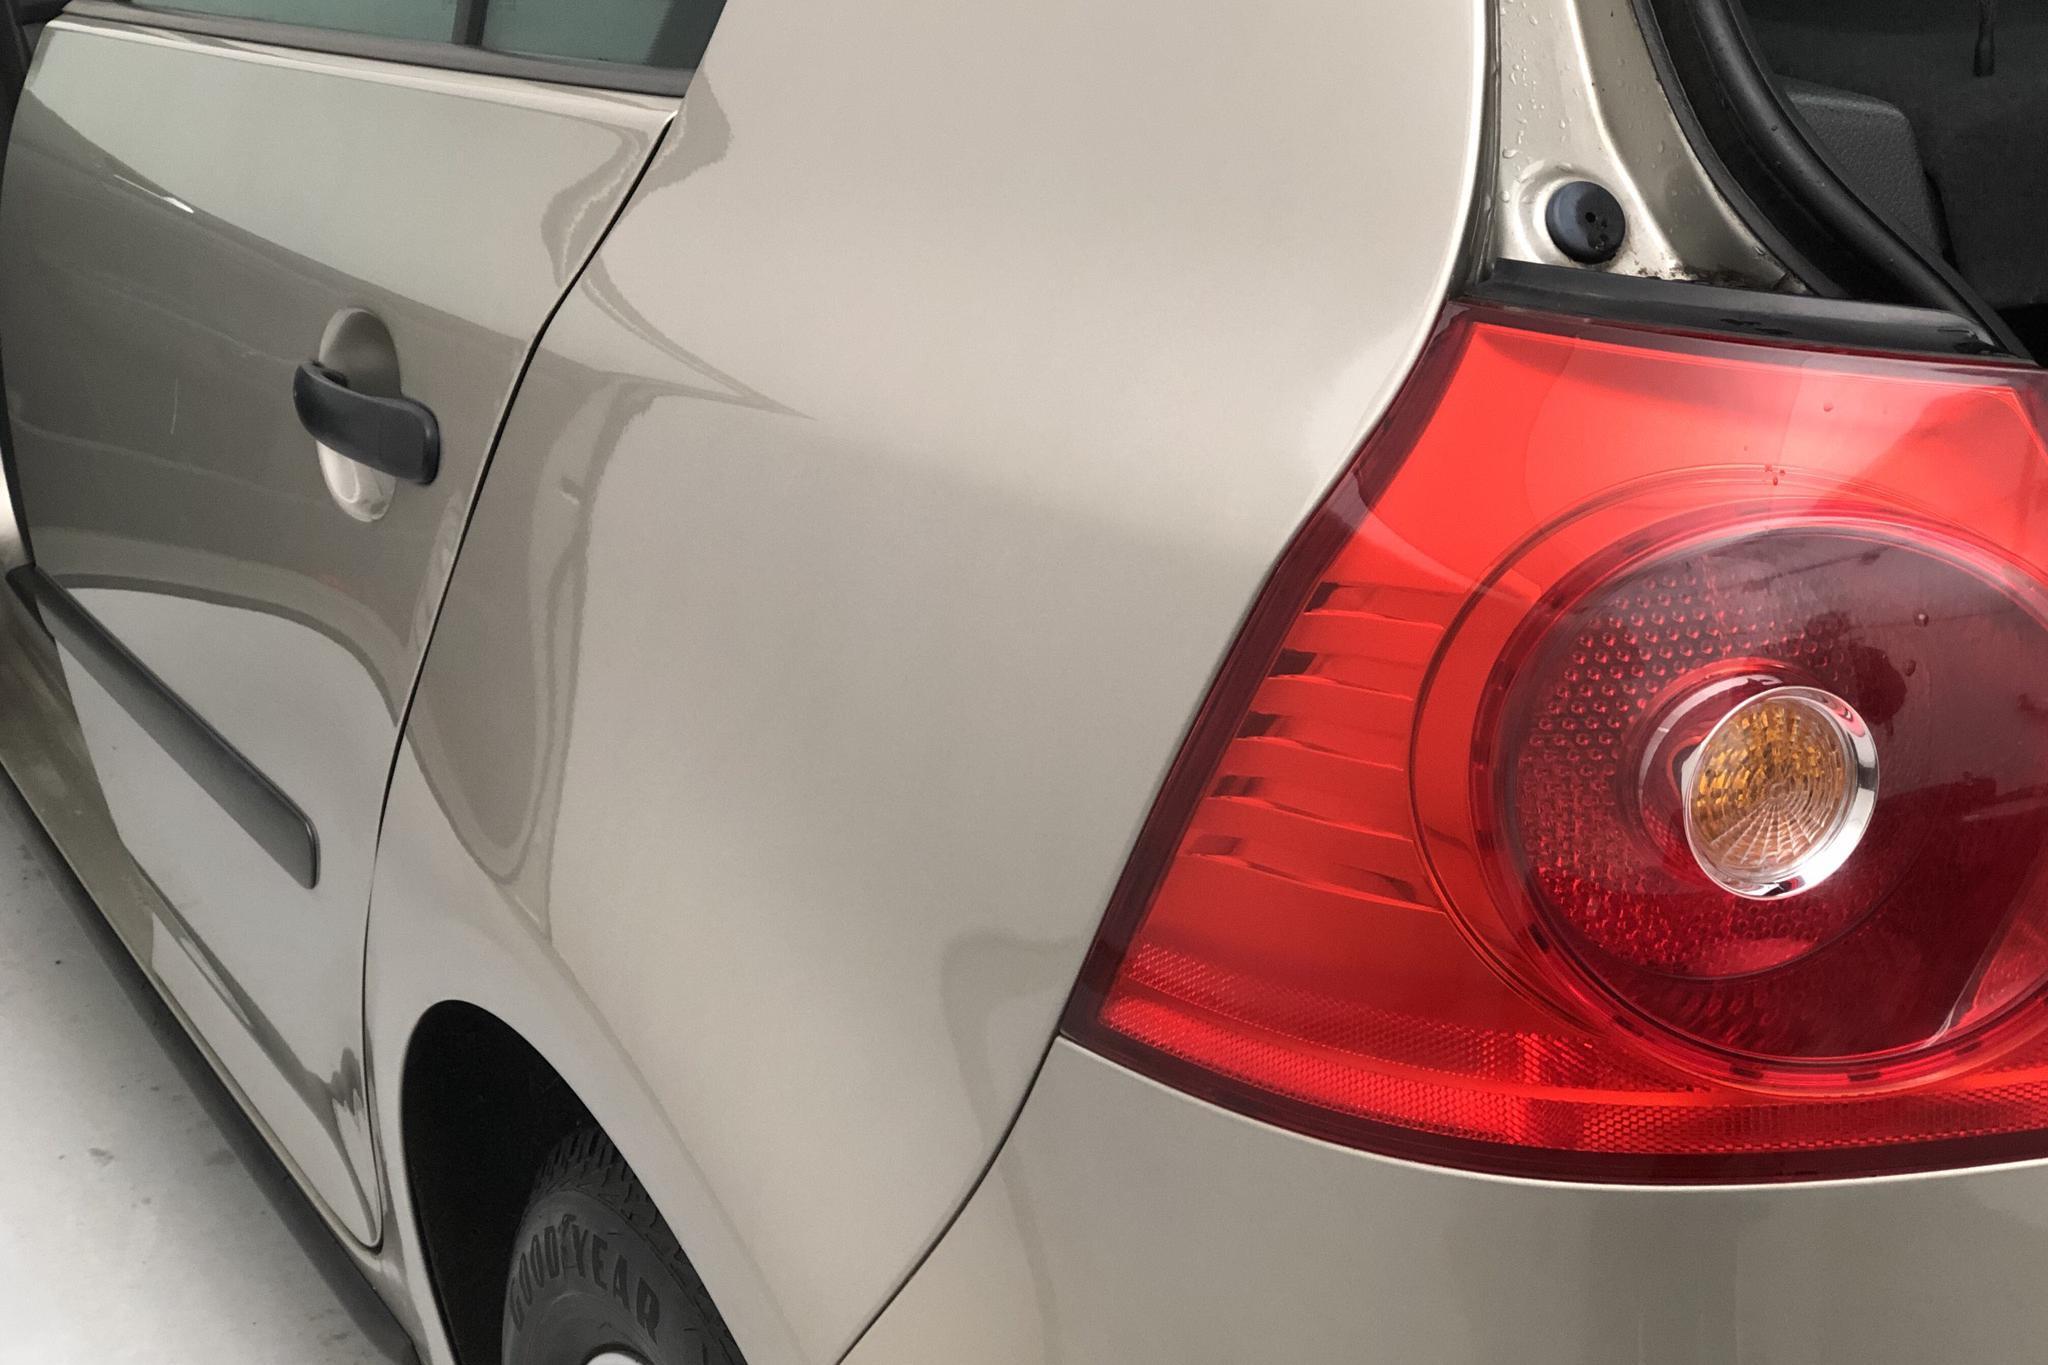 VW Golf A5 1.6 5dr (102hk) - 92 260 km - Manual - Light Brown - 2005